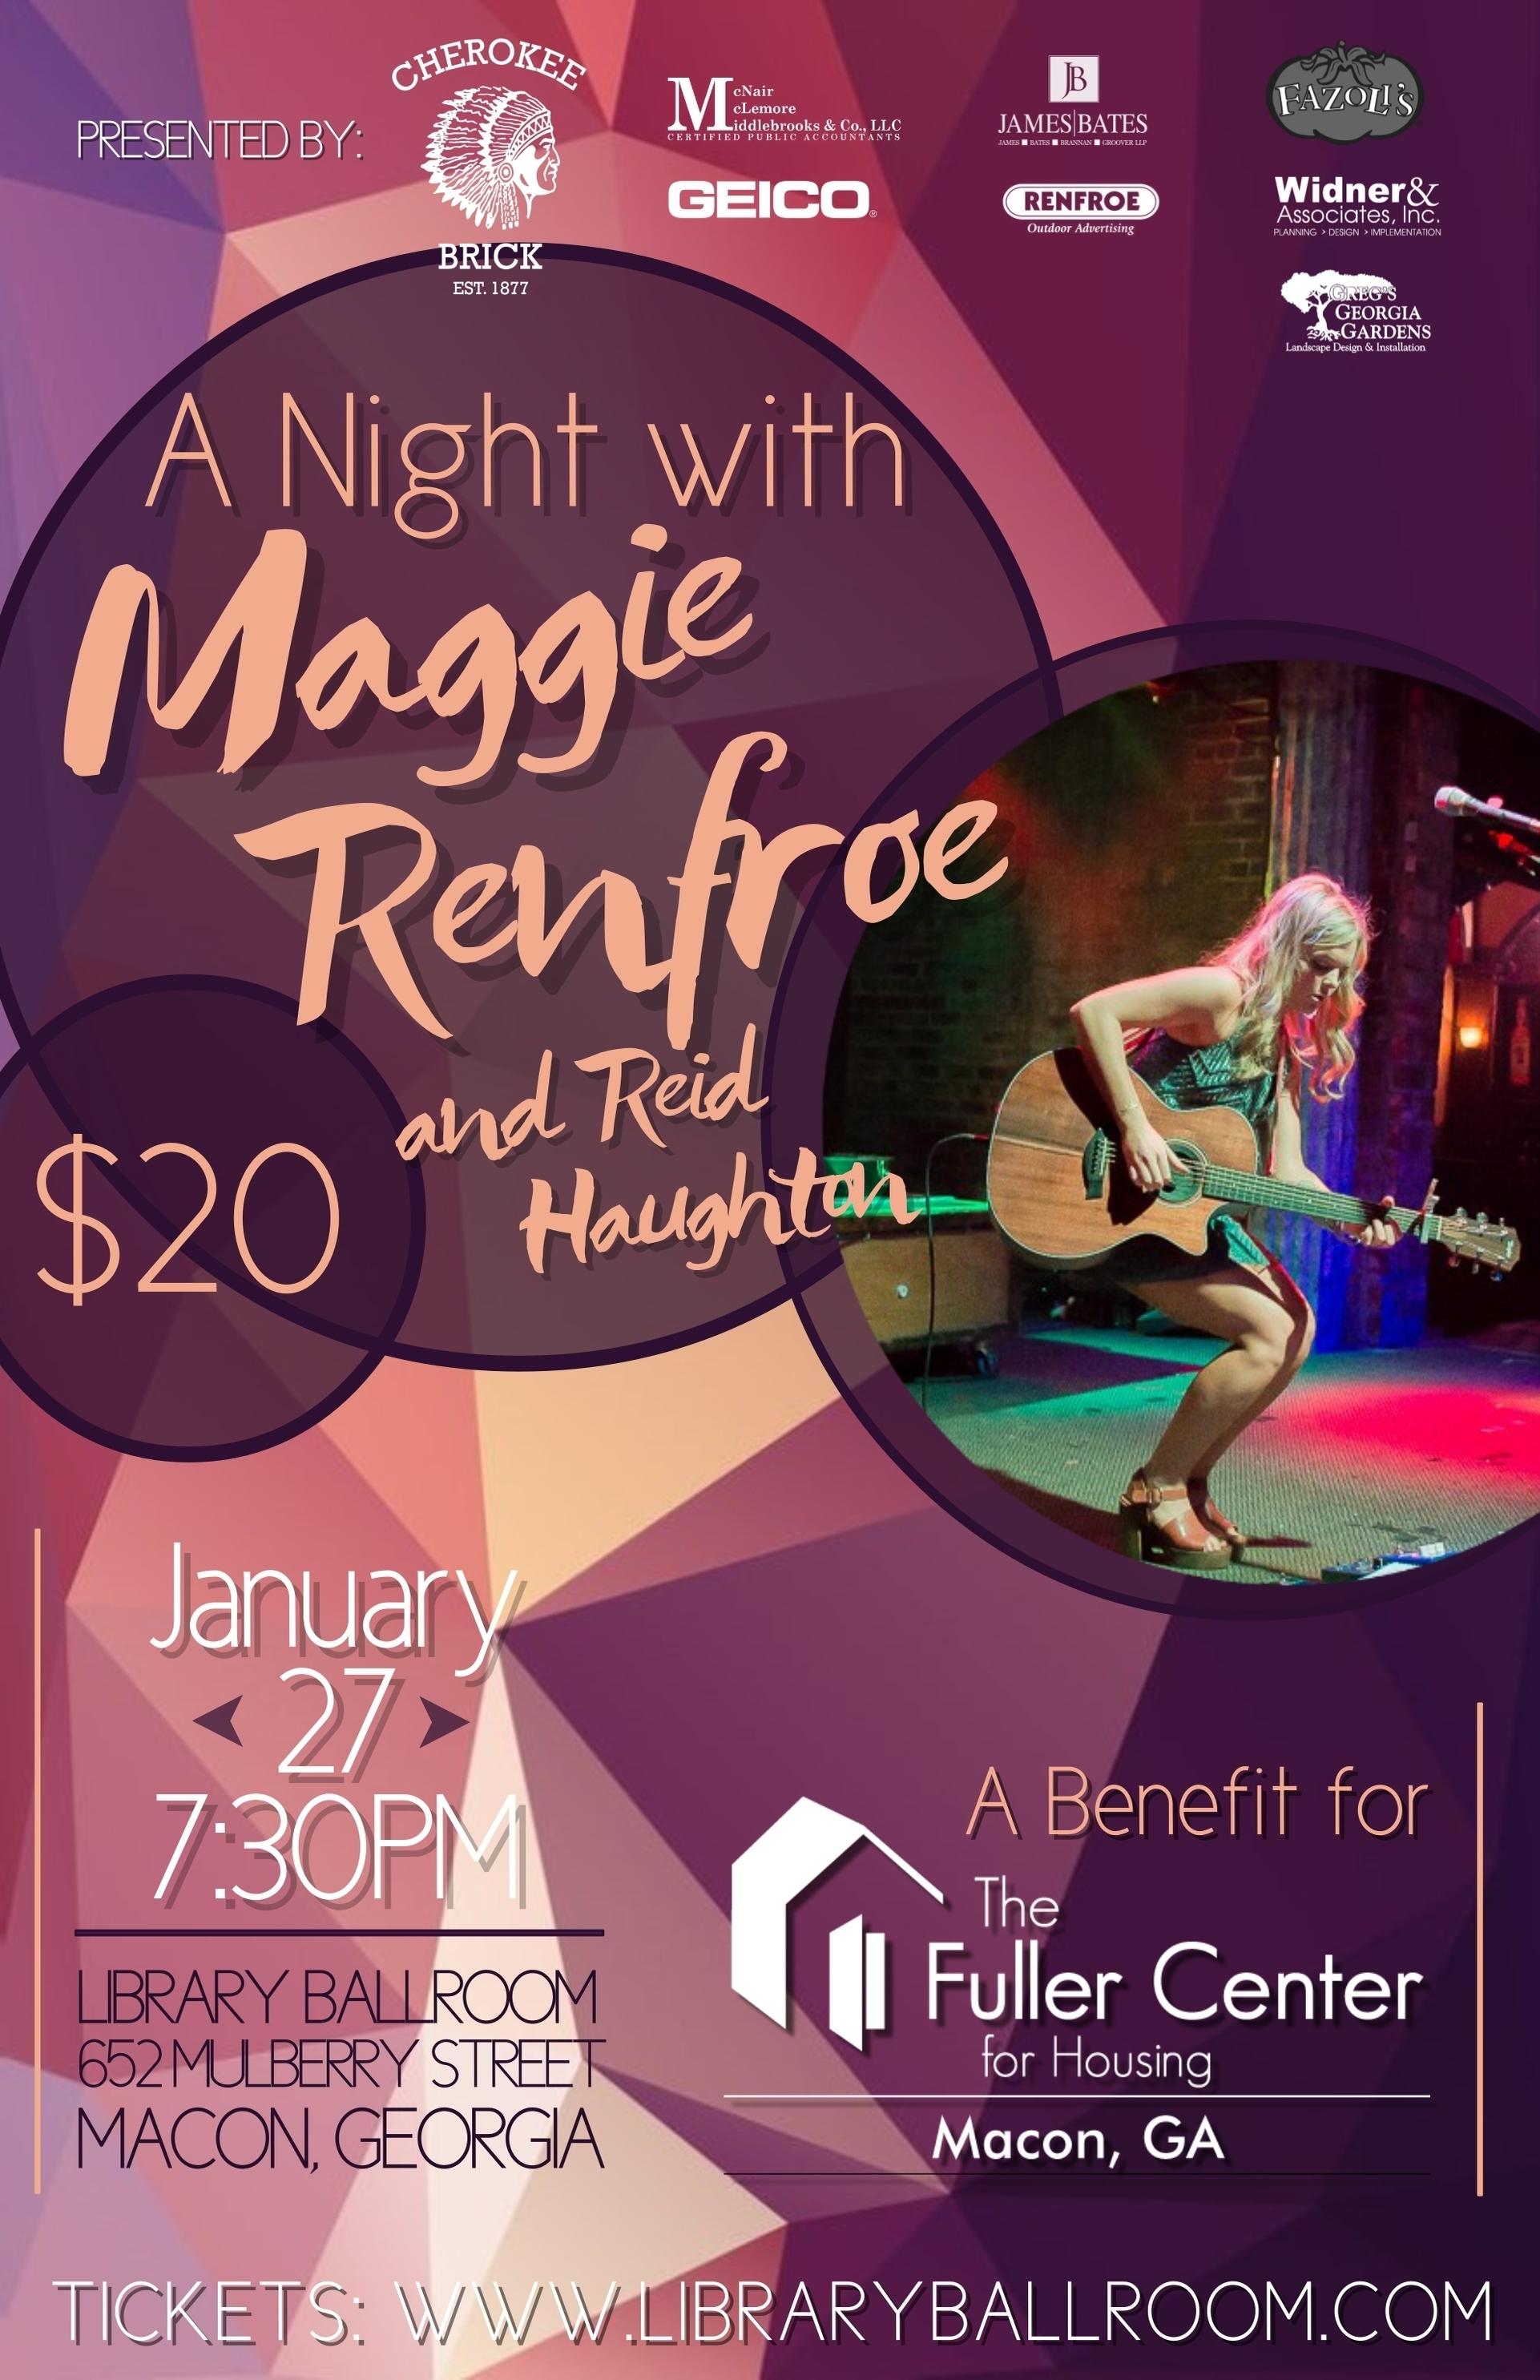 Maggie Renfroe Poster - 012718.jpg